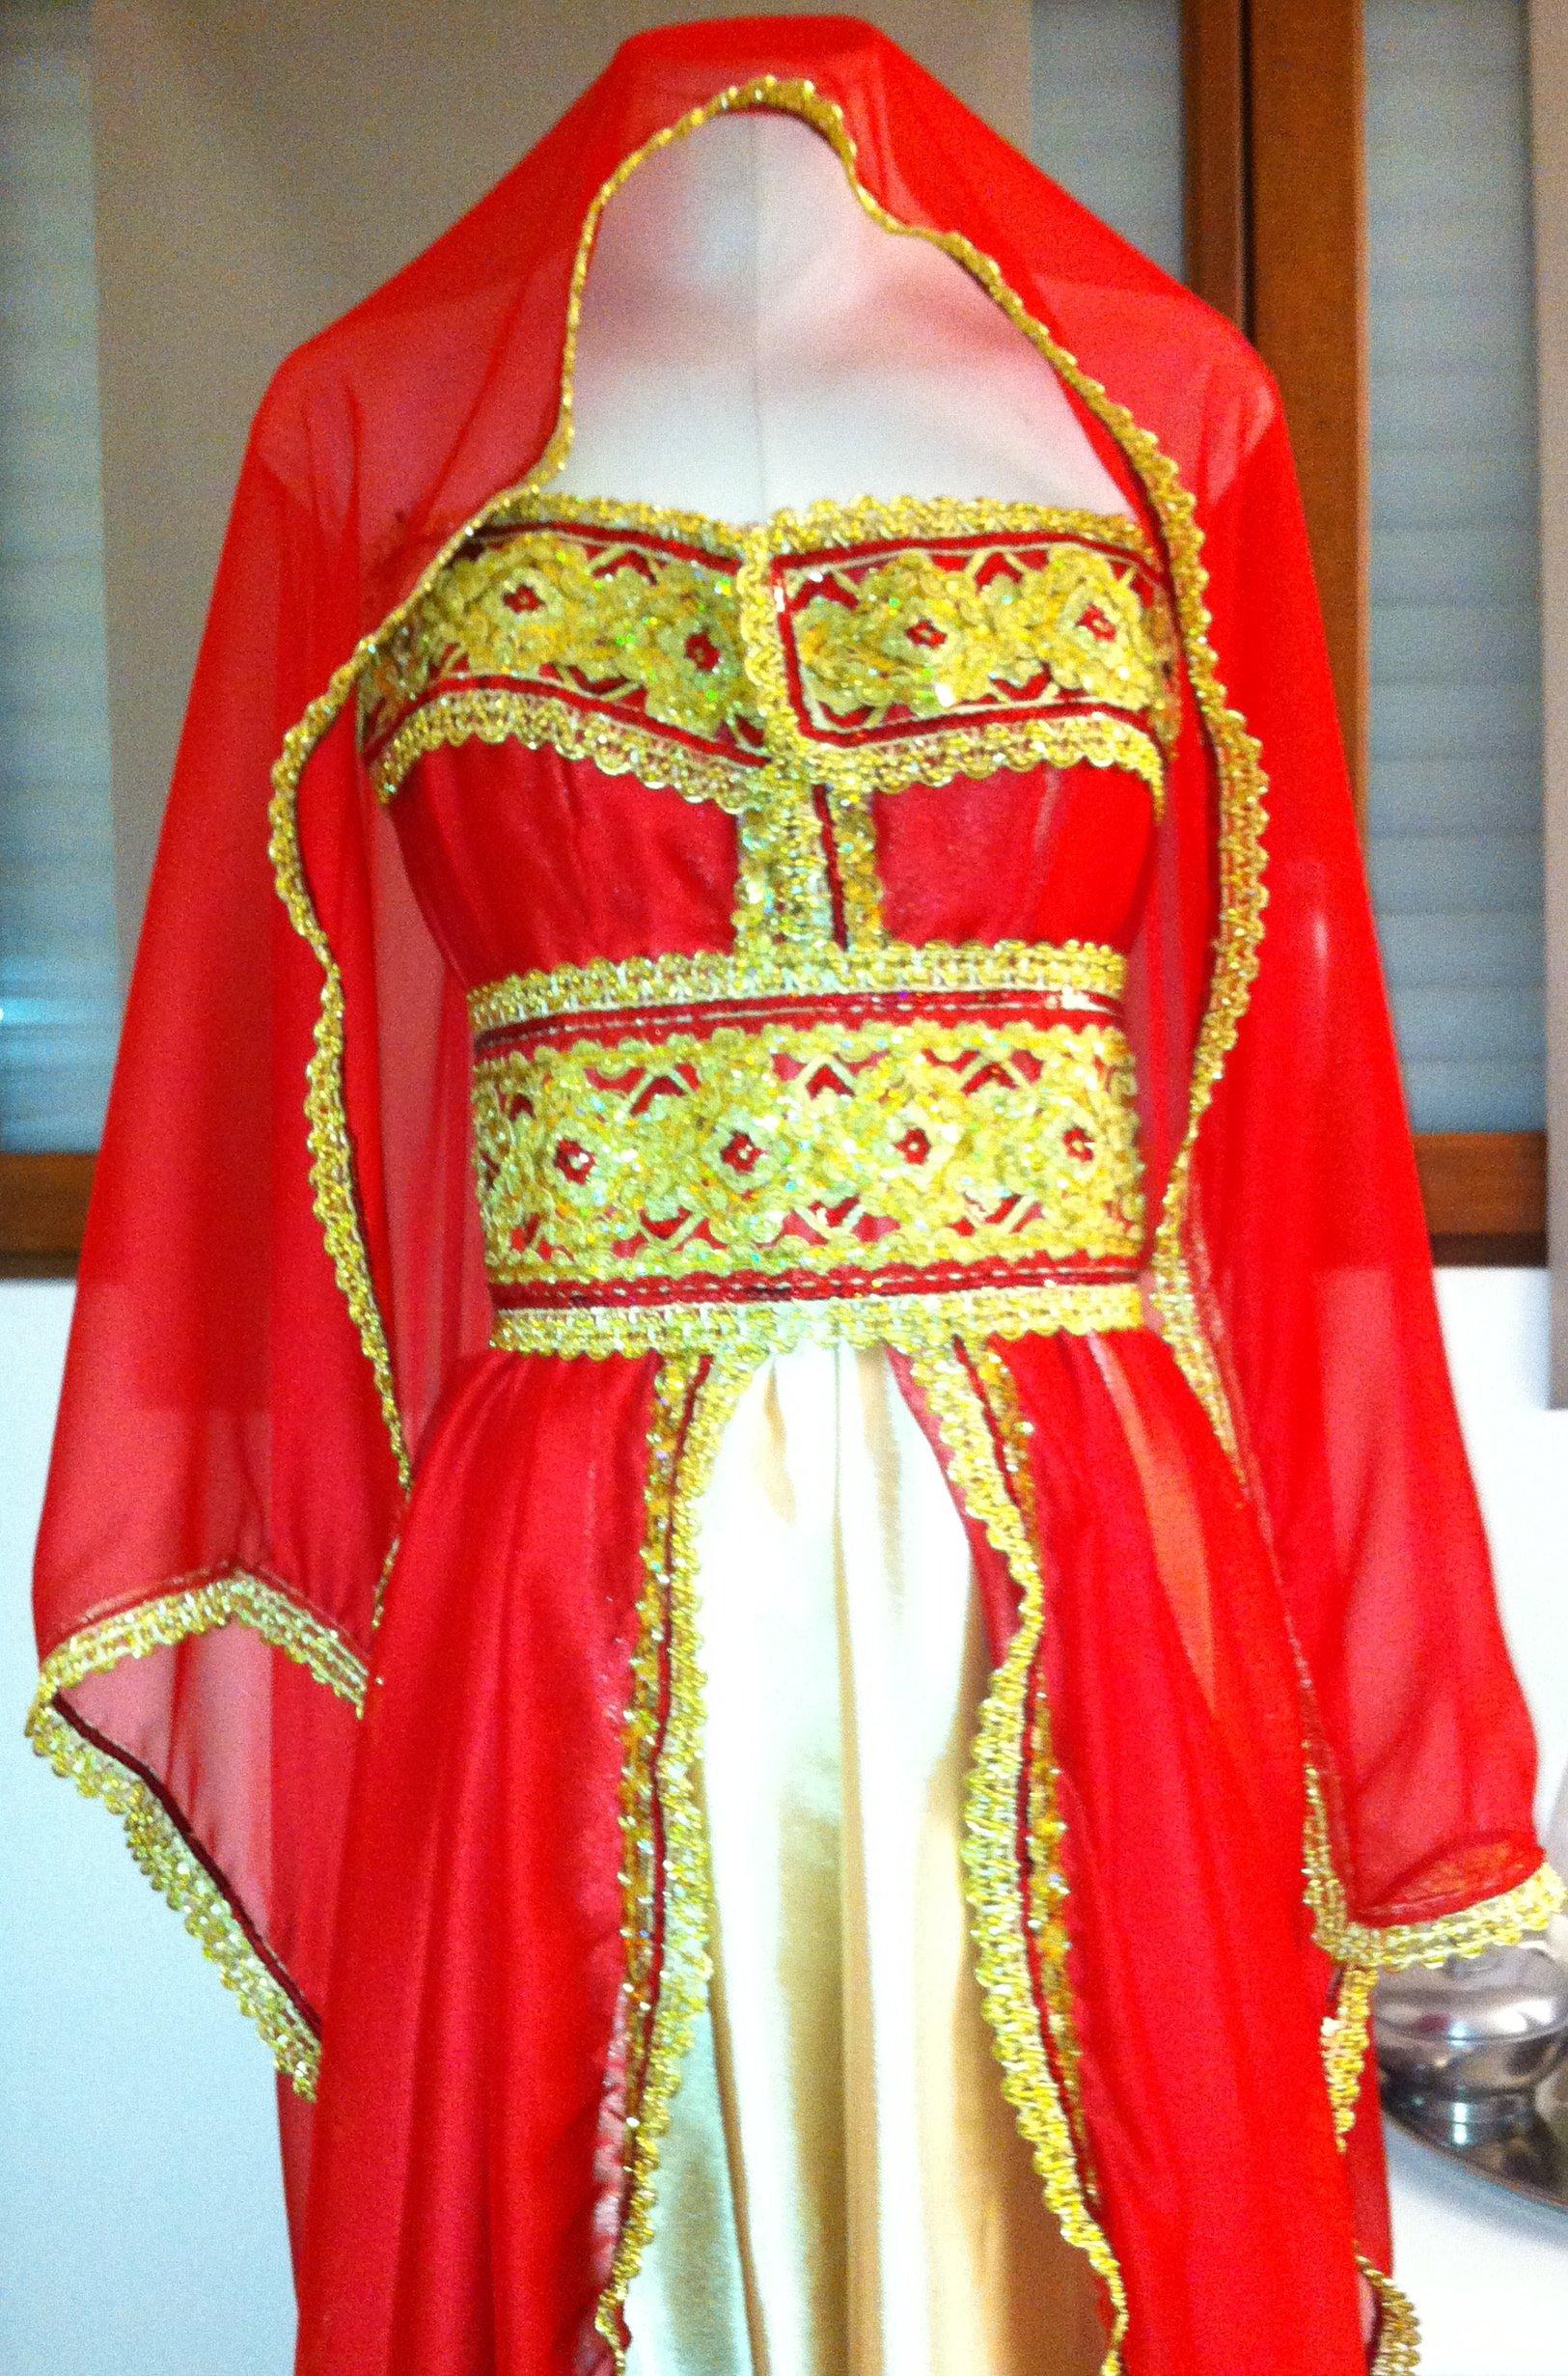 robe moderne kabyle 2012